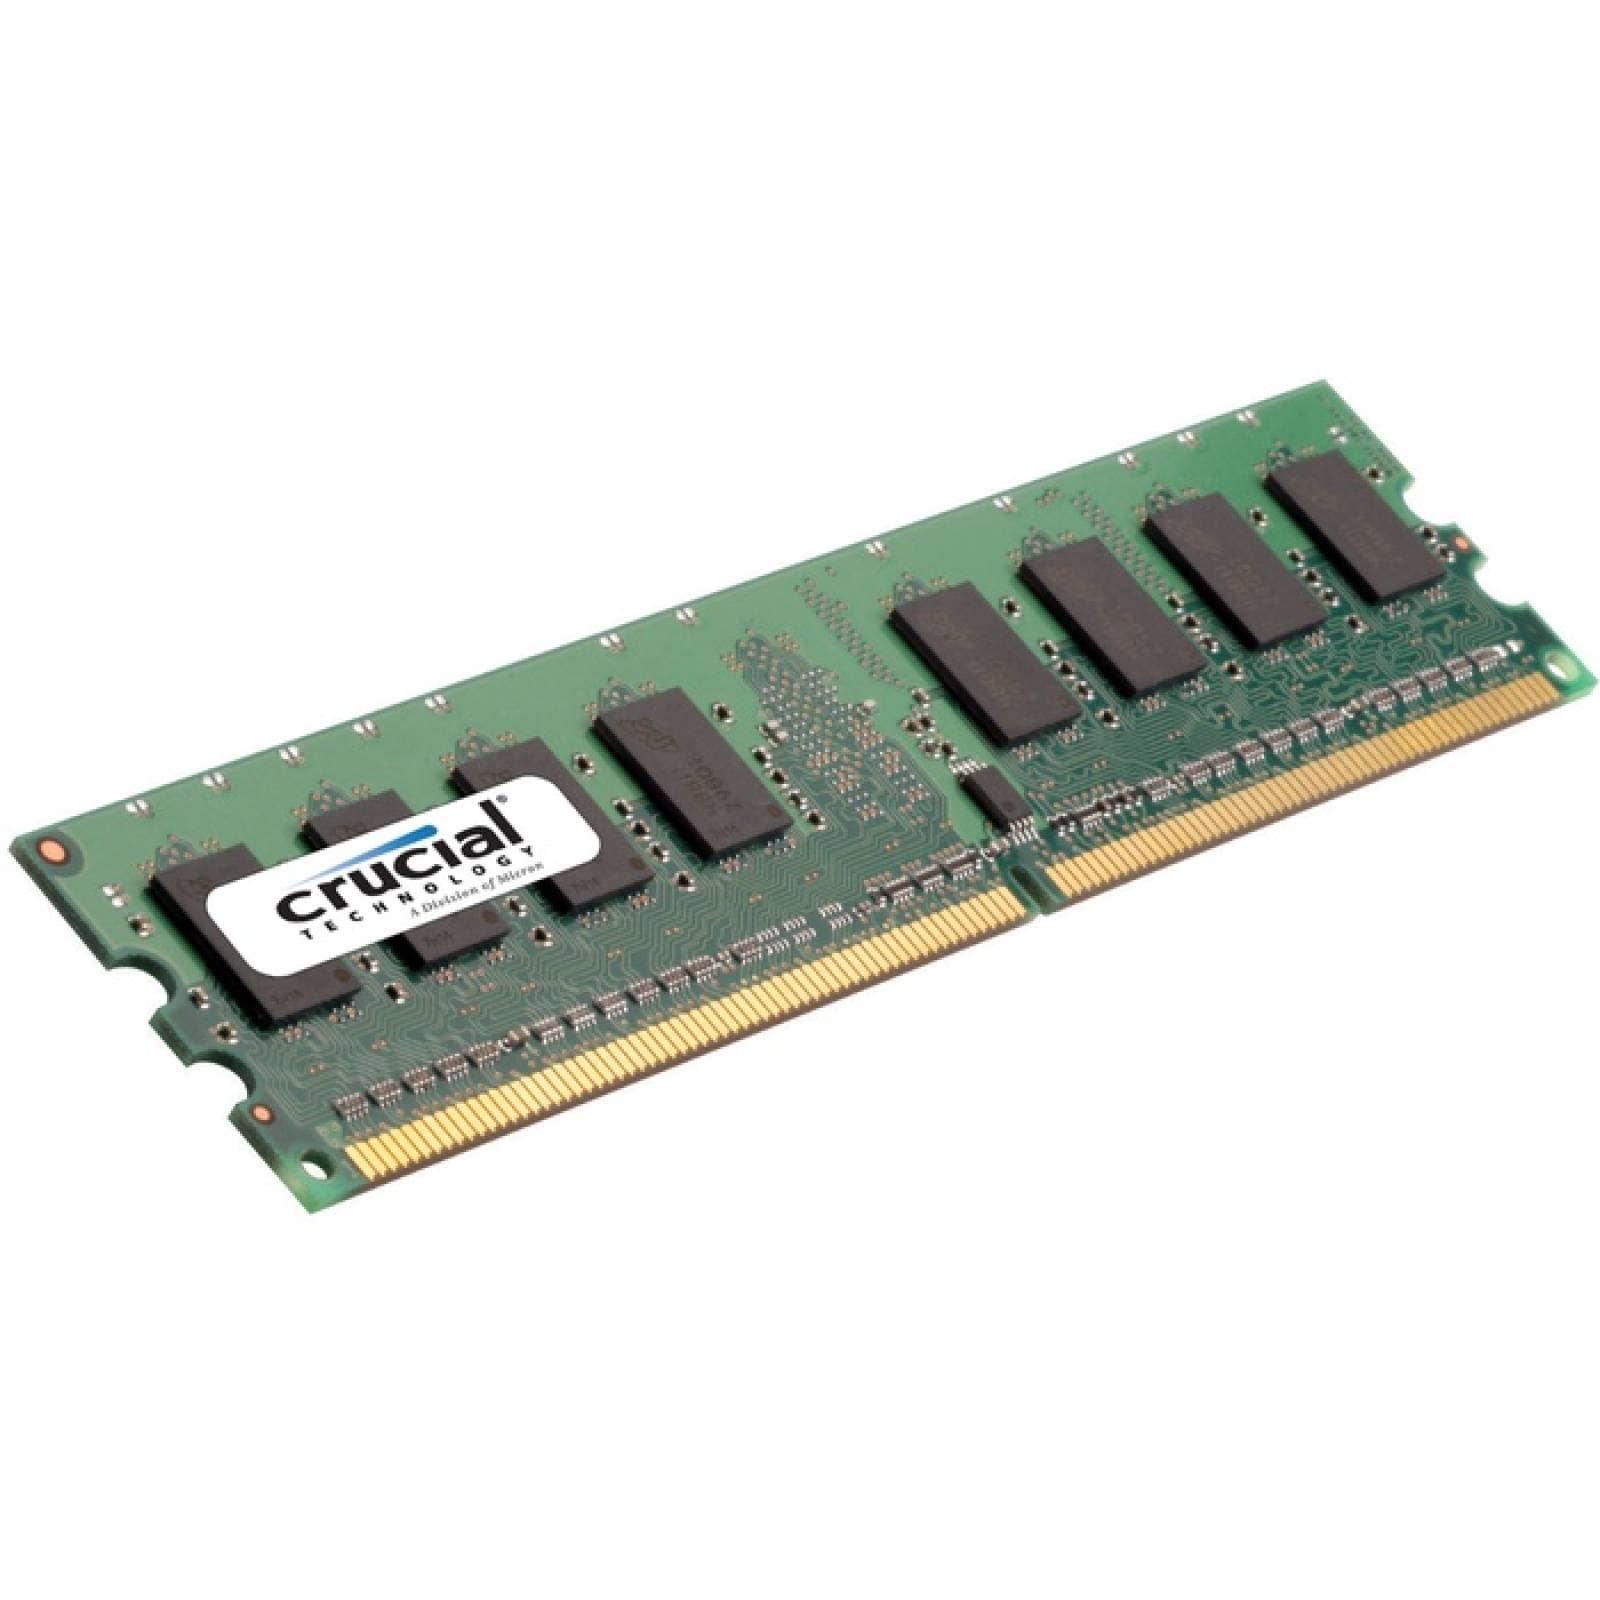 Mdulo de memoria SDRAM DDR3 de 16 GB (1 x 16 GB) crucial